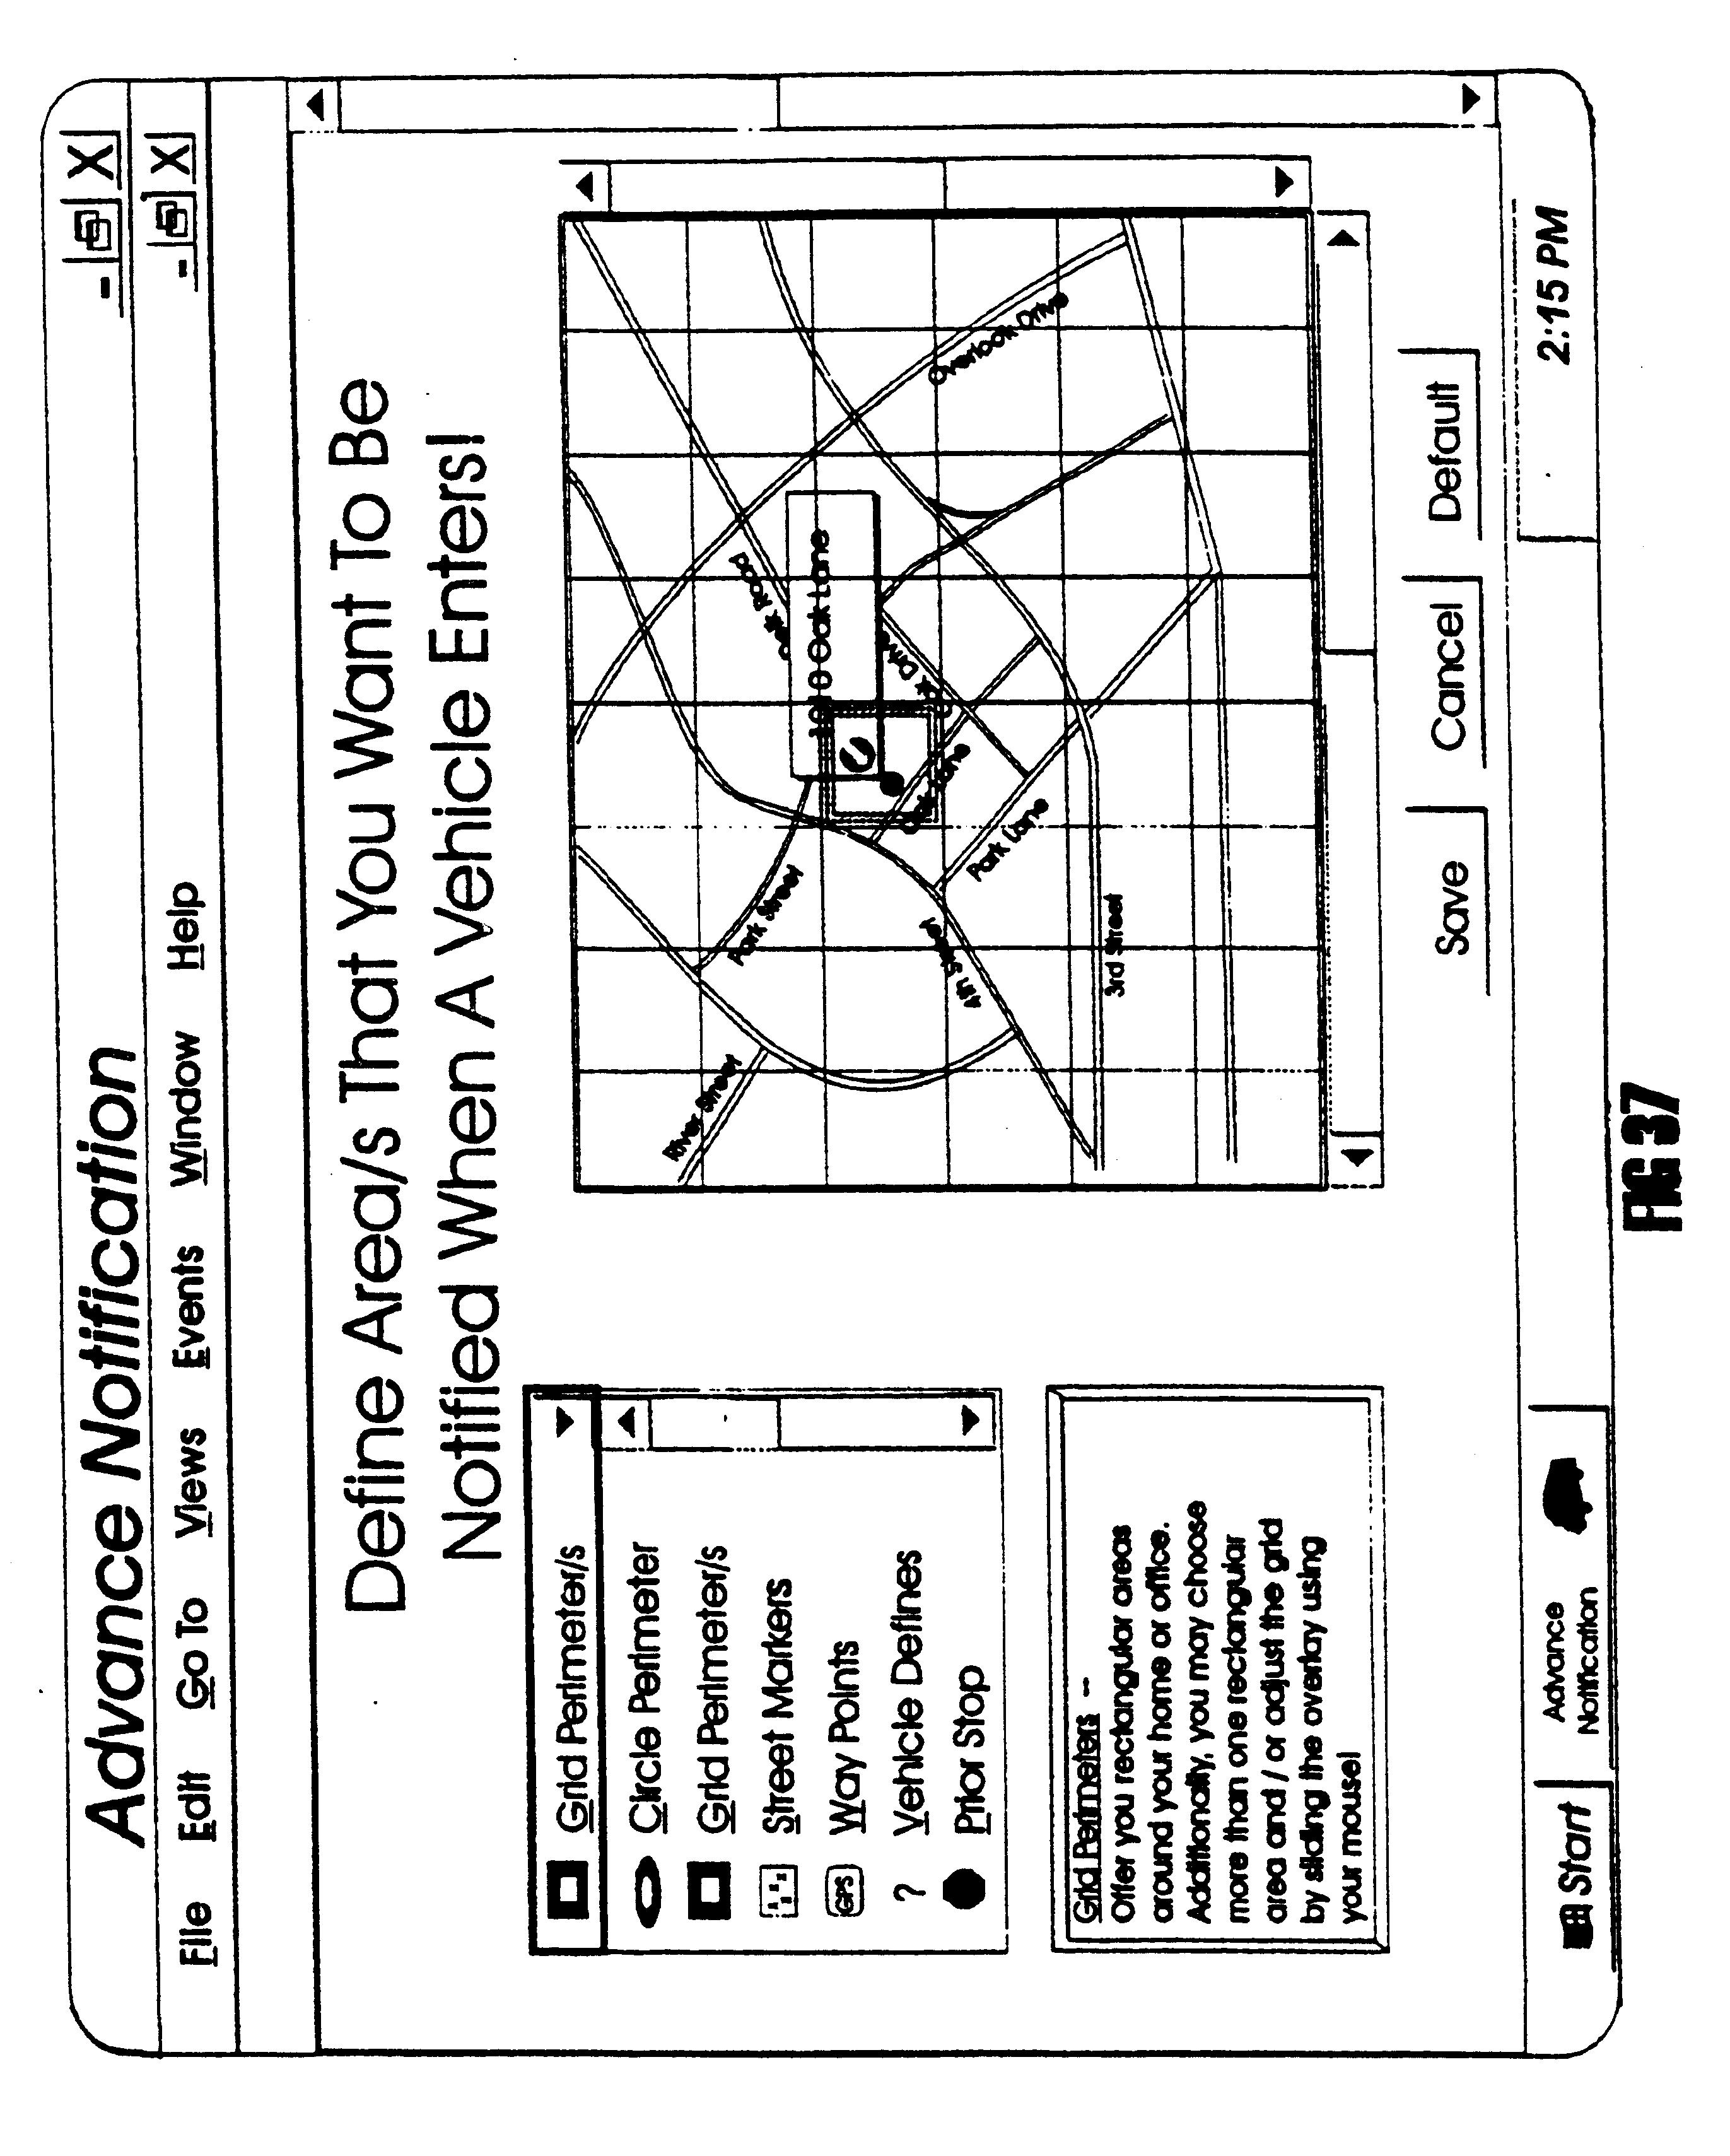 Patent US 6,748,320 B2 on